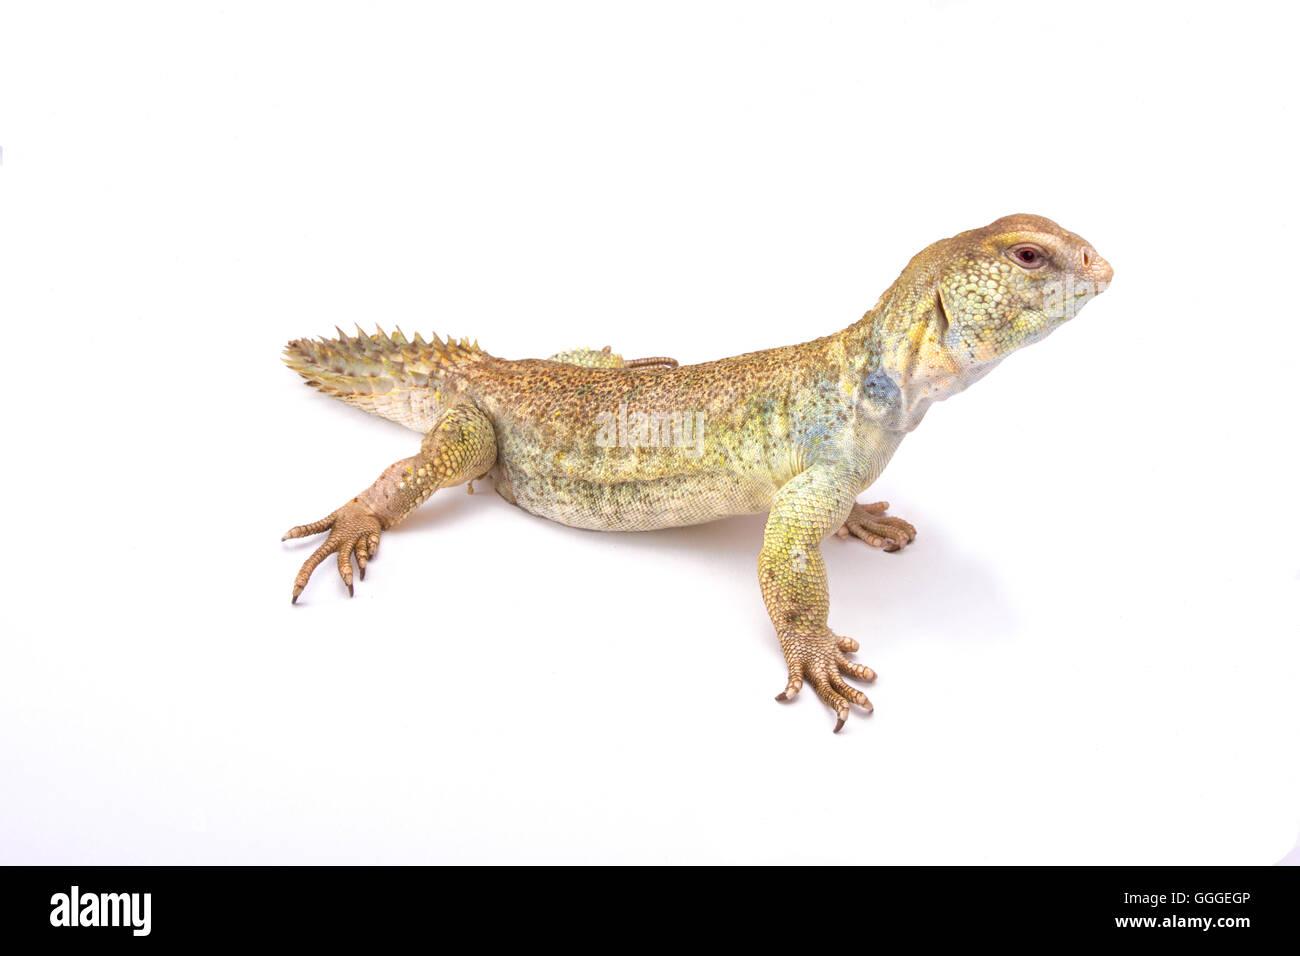 Princely spiny-tailed lizard (Uromastyx princeps) - Stock Image